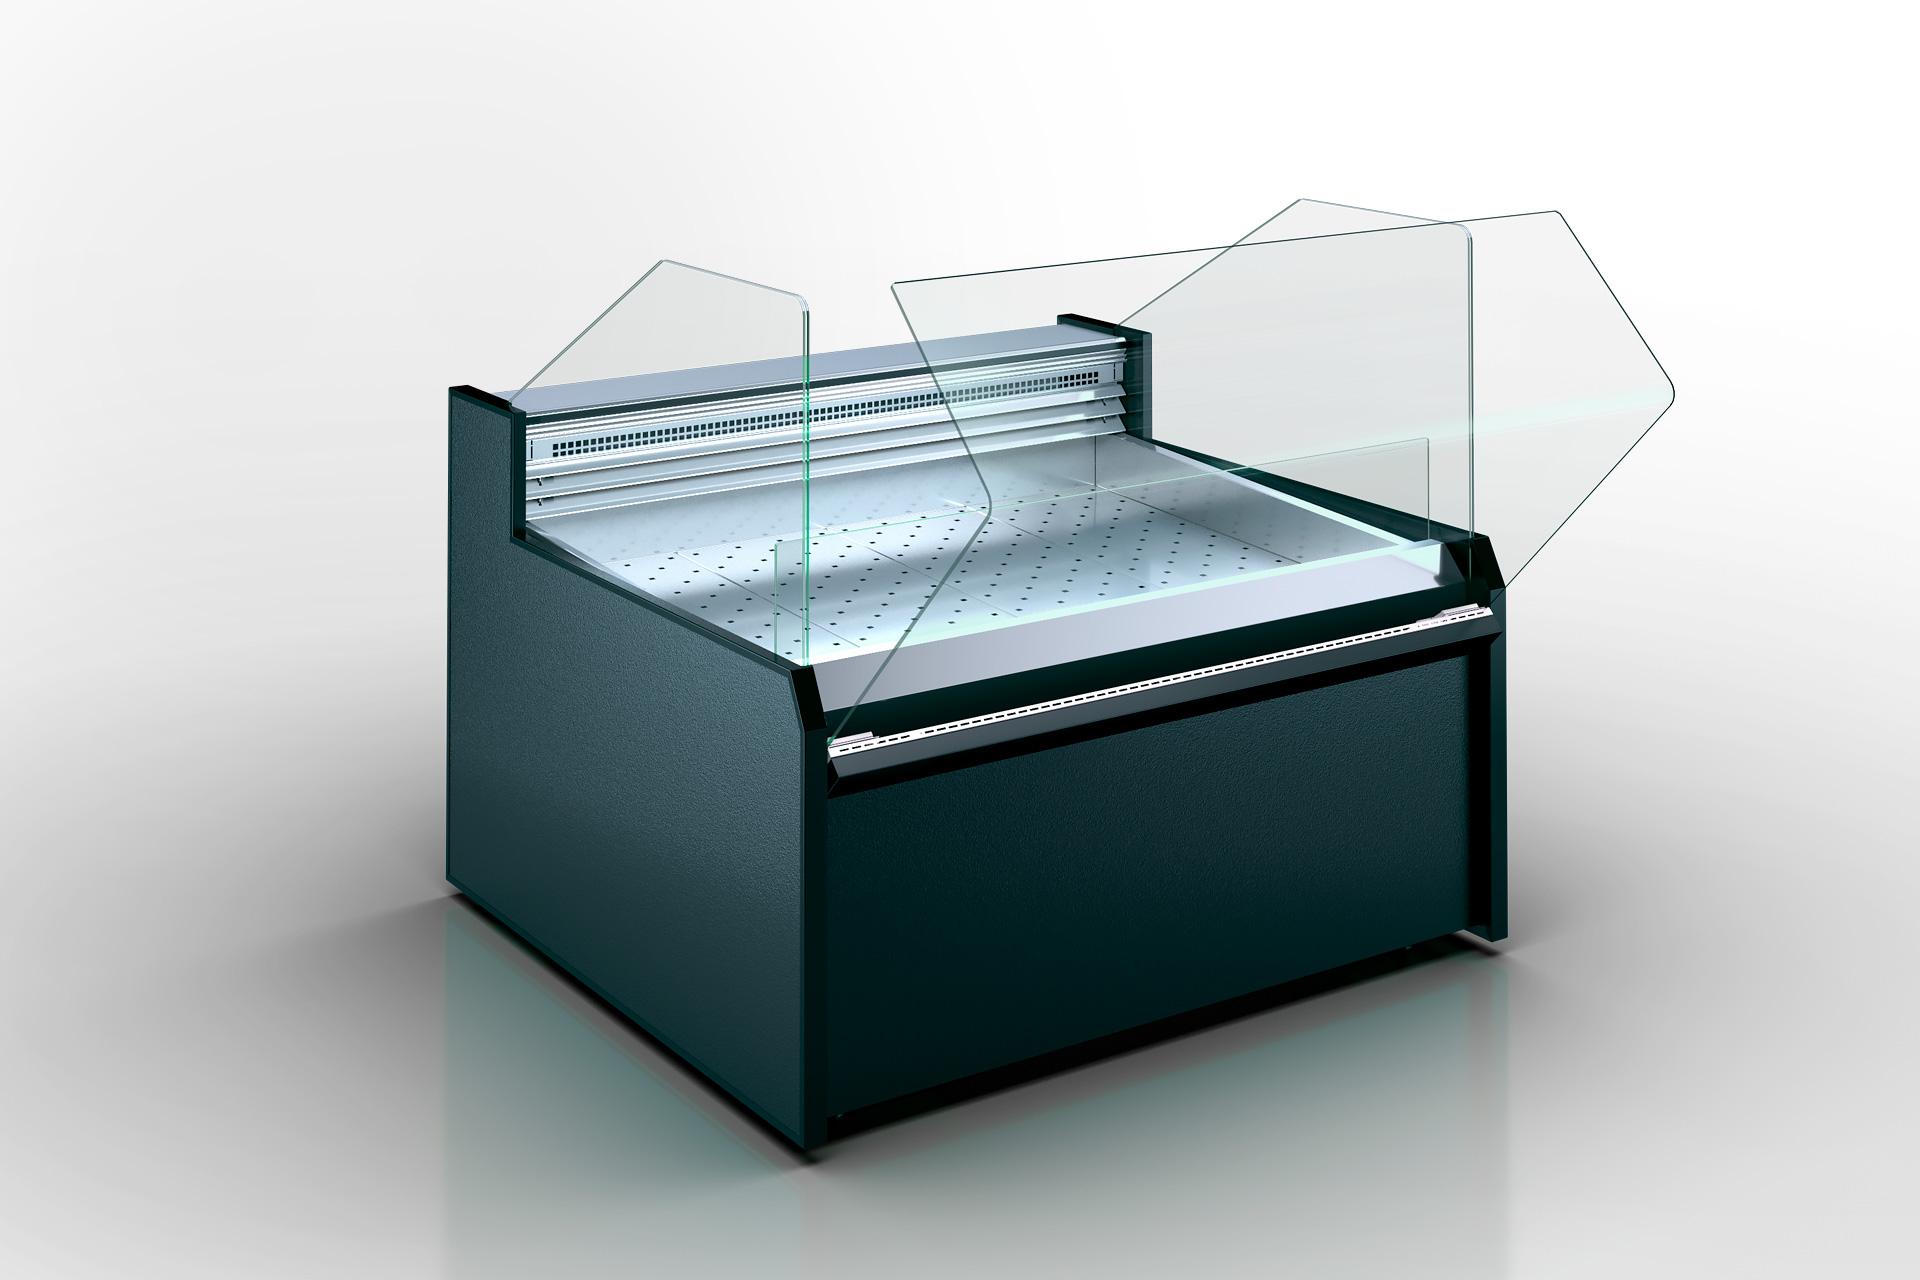 Refrigerated counters Missouri MC 120 fish OS 120-SLM/SLA, Missouri MC 120 fish OS 120-SPLM/SPLA